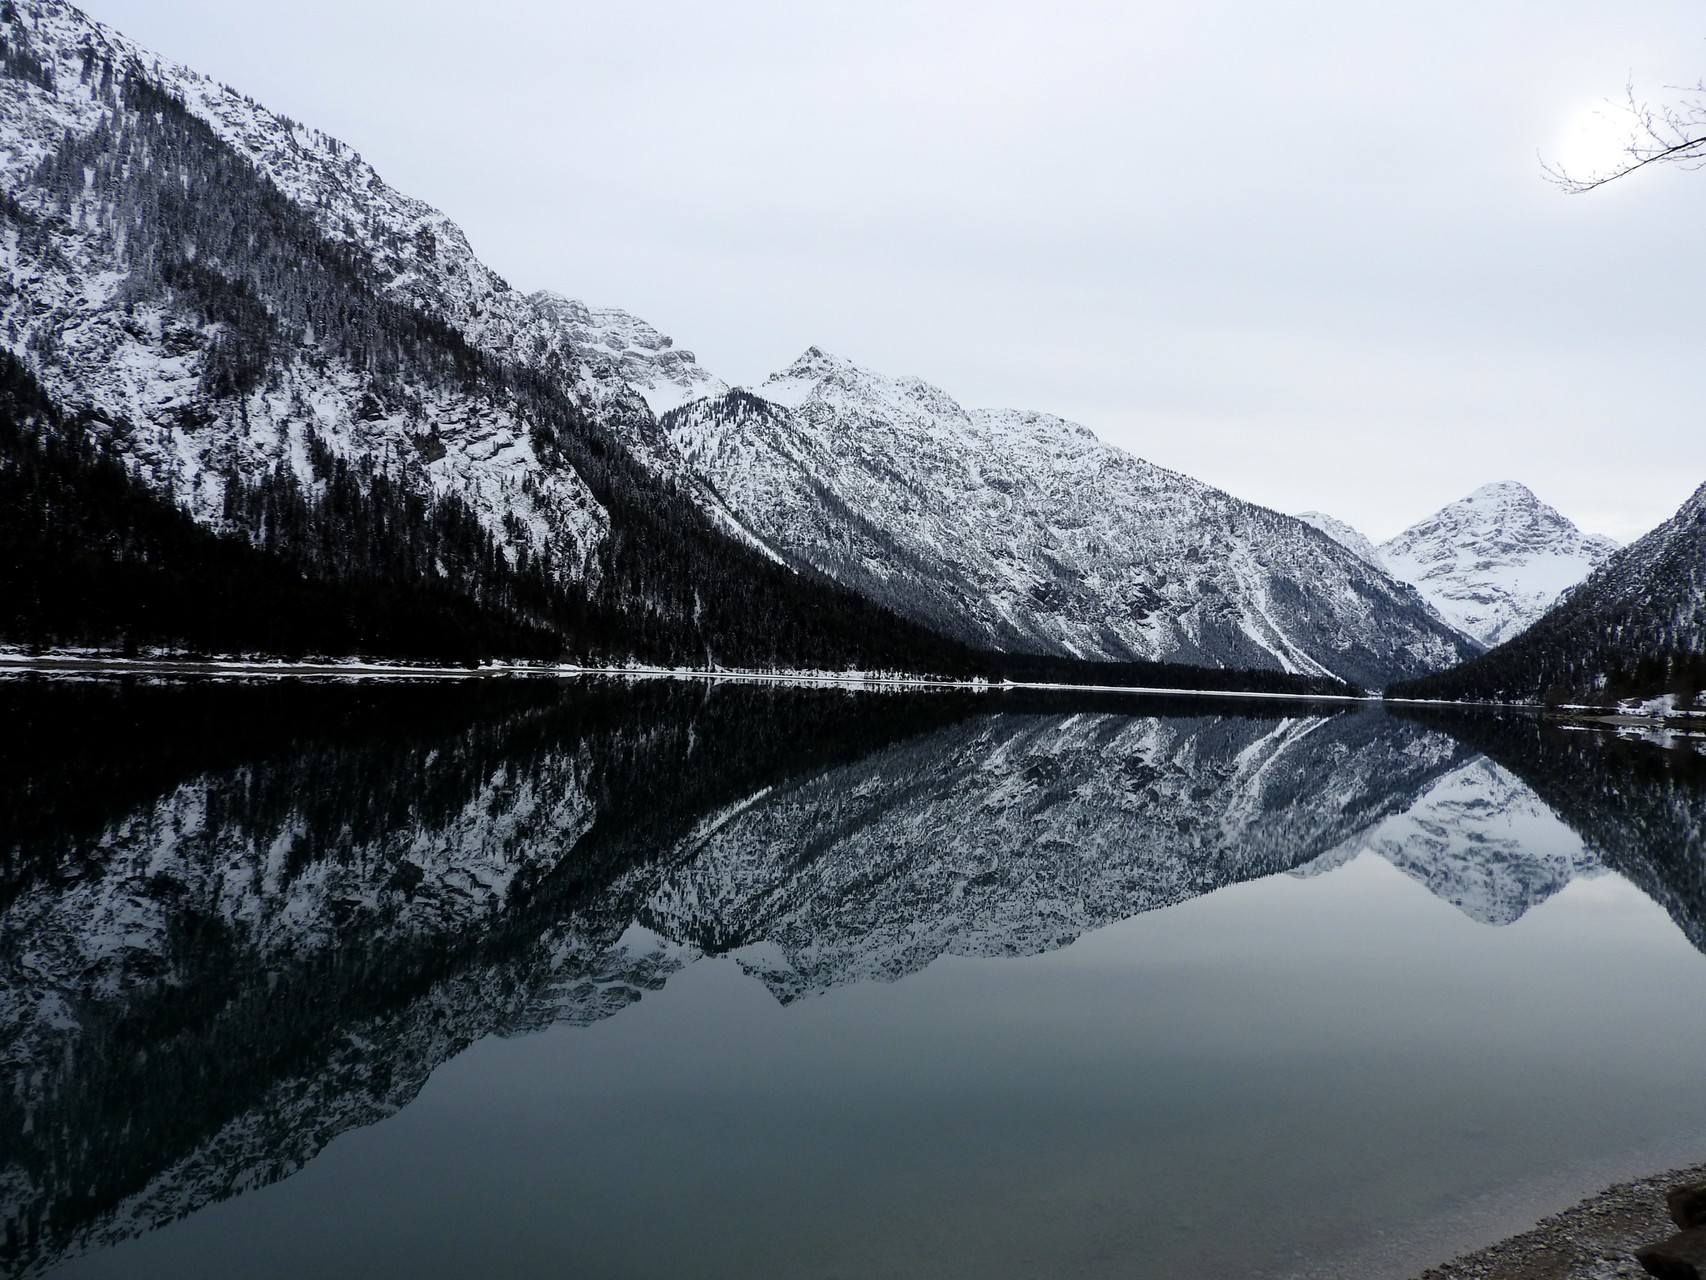 Blick über den ruhigen See